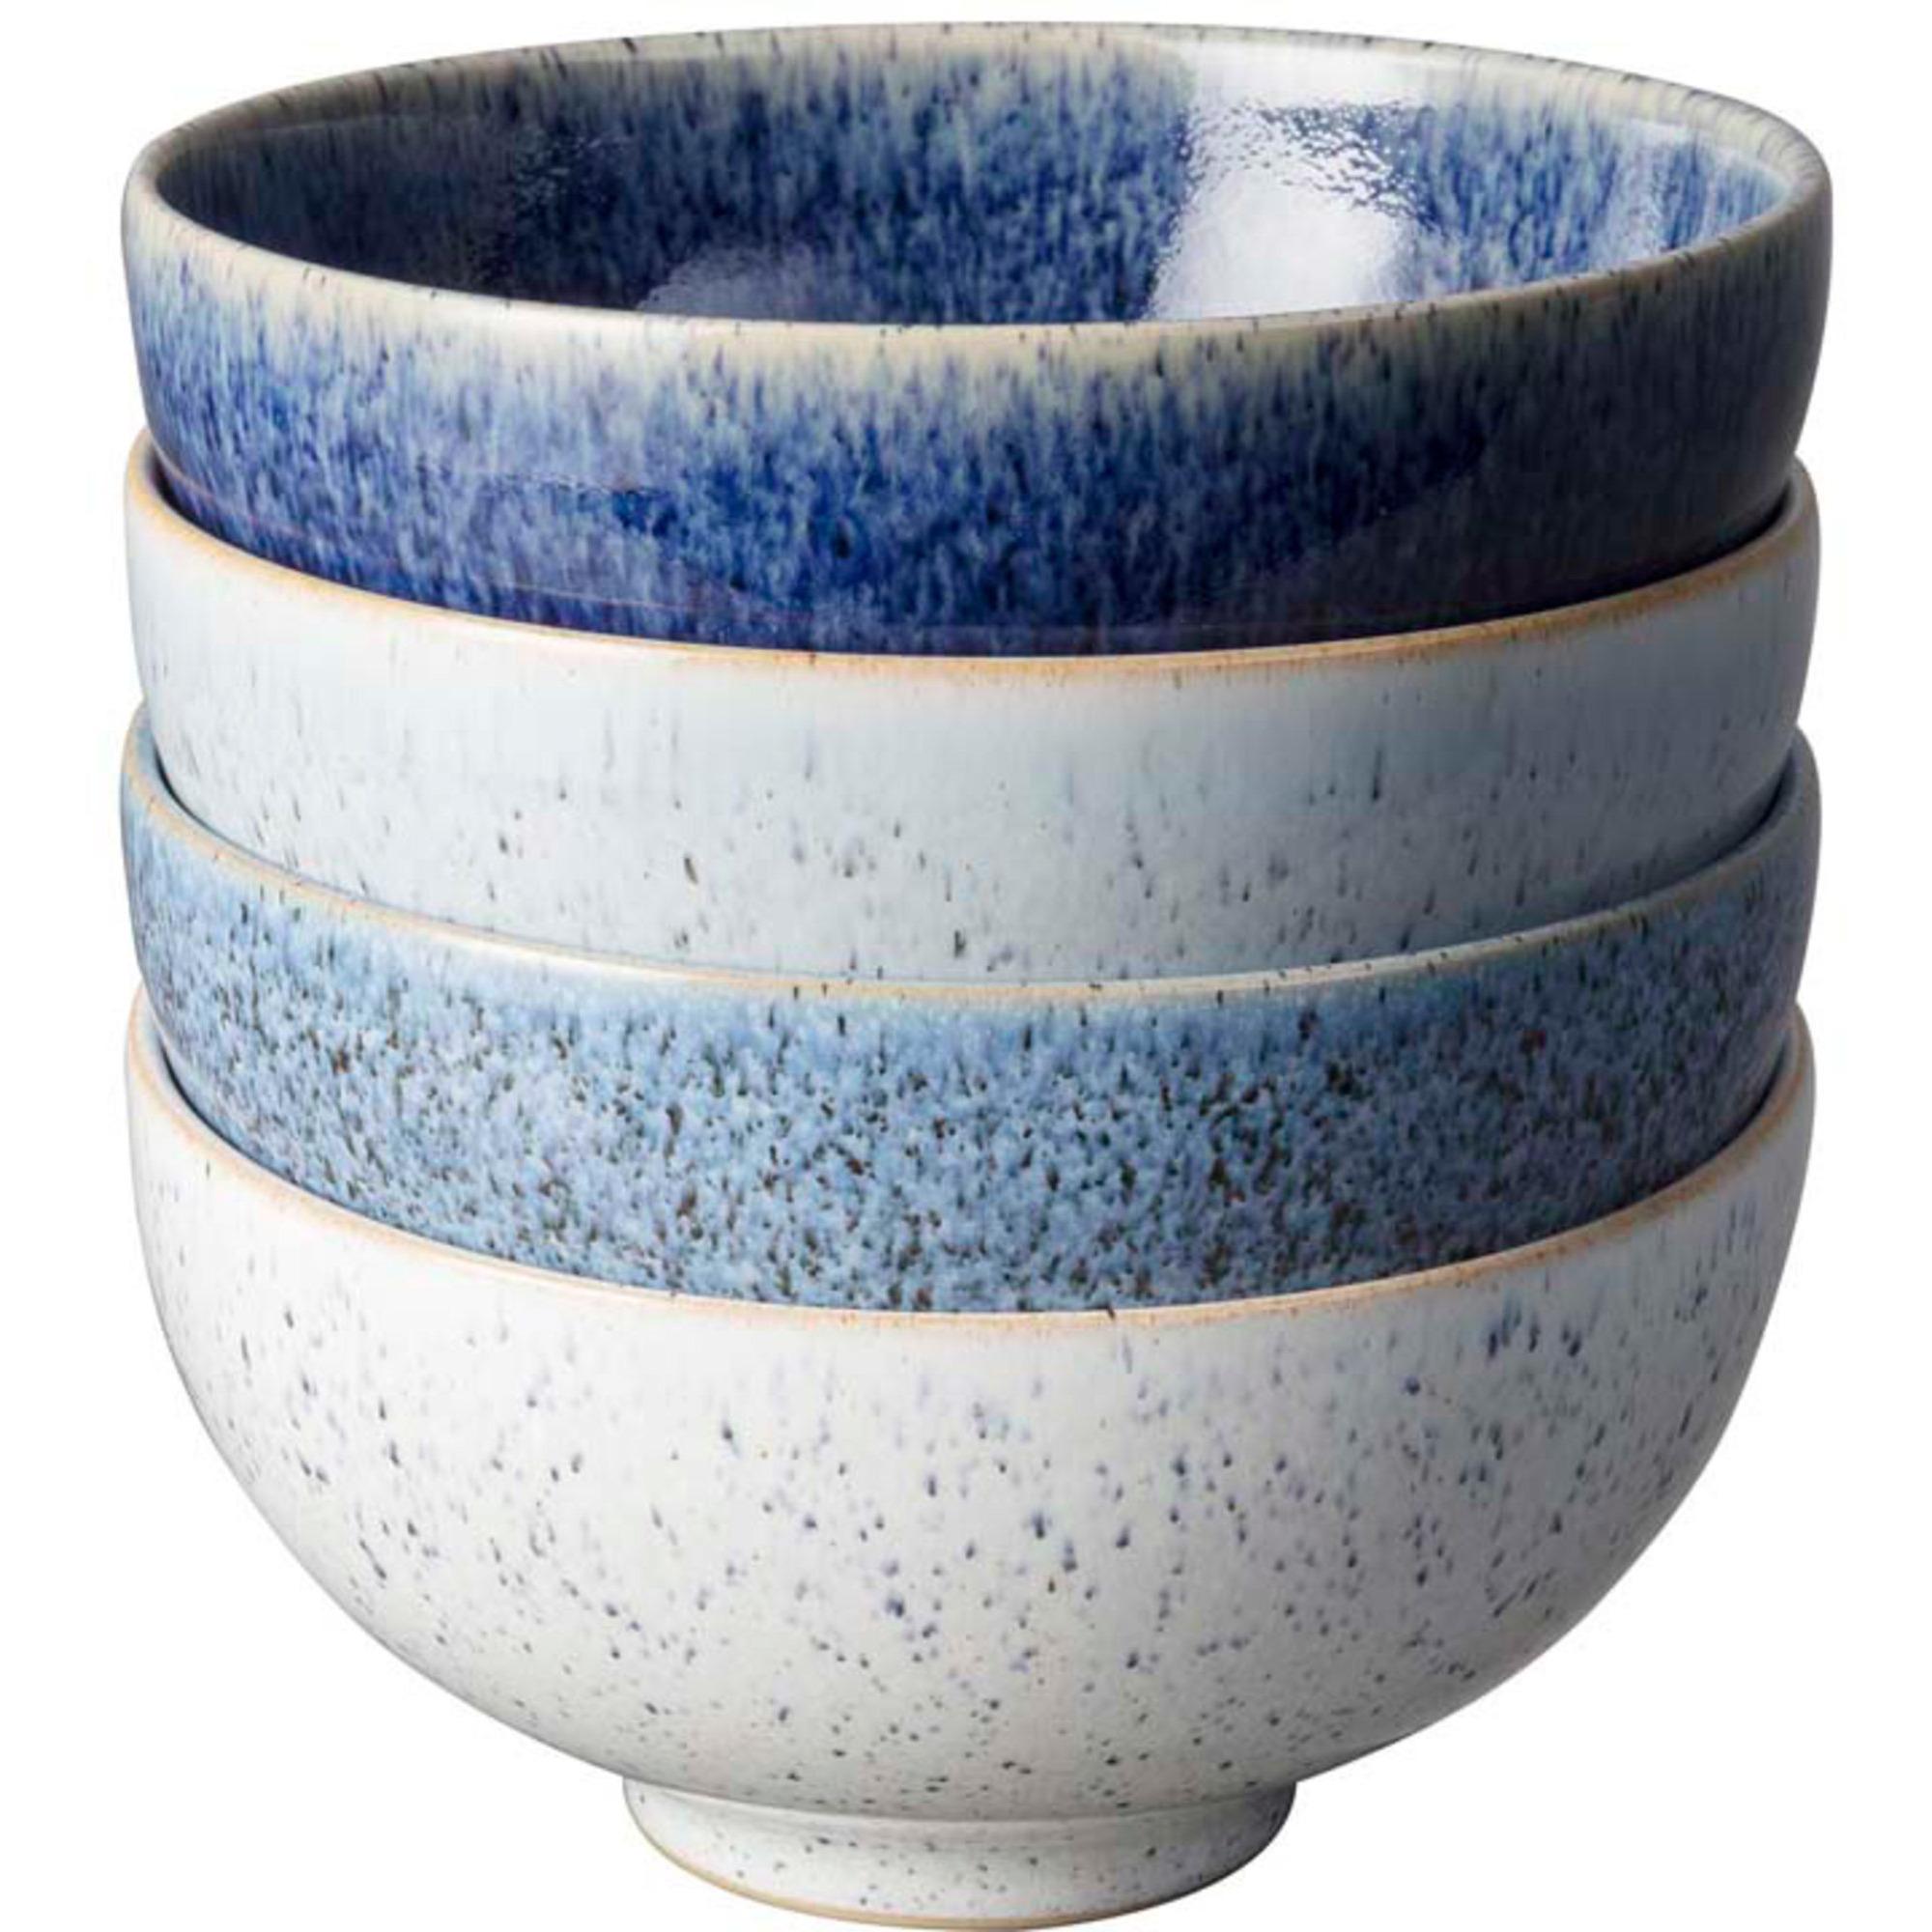 Denby Studio Blue Skål Small 13 cm 4- Pack Rice Bowls